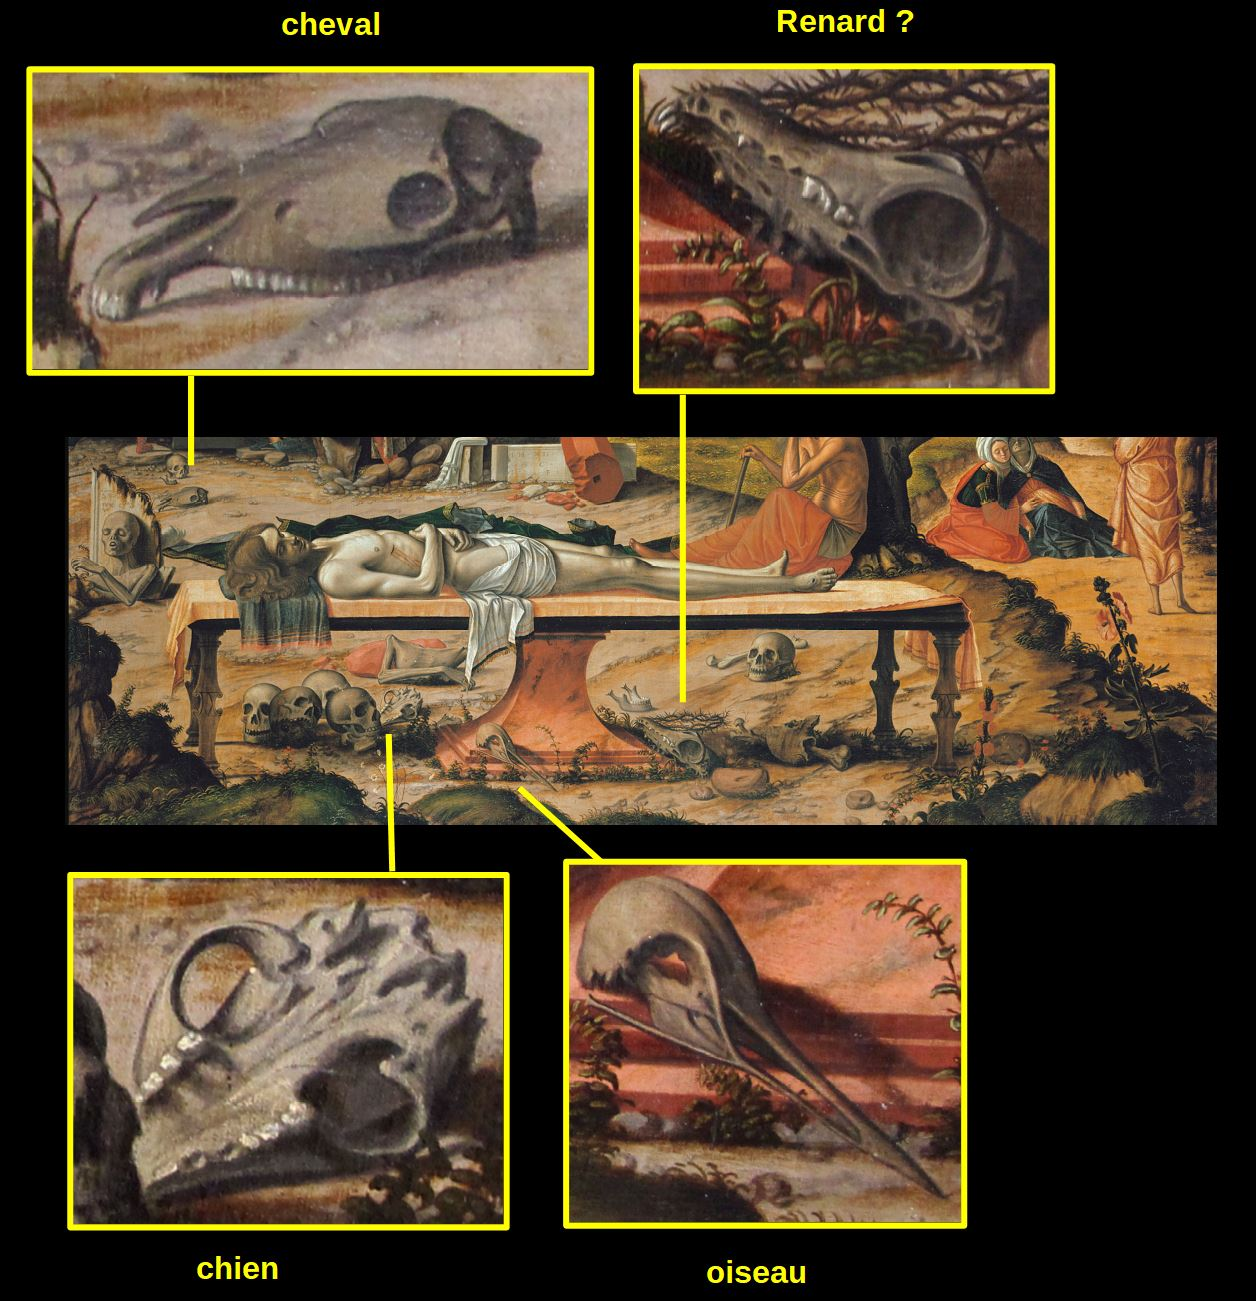 Vittore_Carpaccio_-_Preparation_of_Christ's_Tomb_-_Google_Art_Project (1505), Staatliche Museen, Berlin cranes